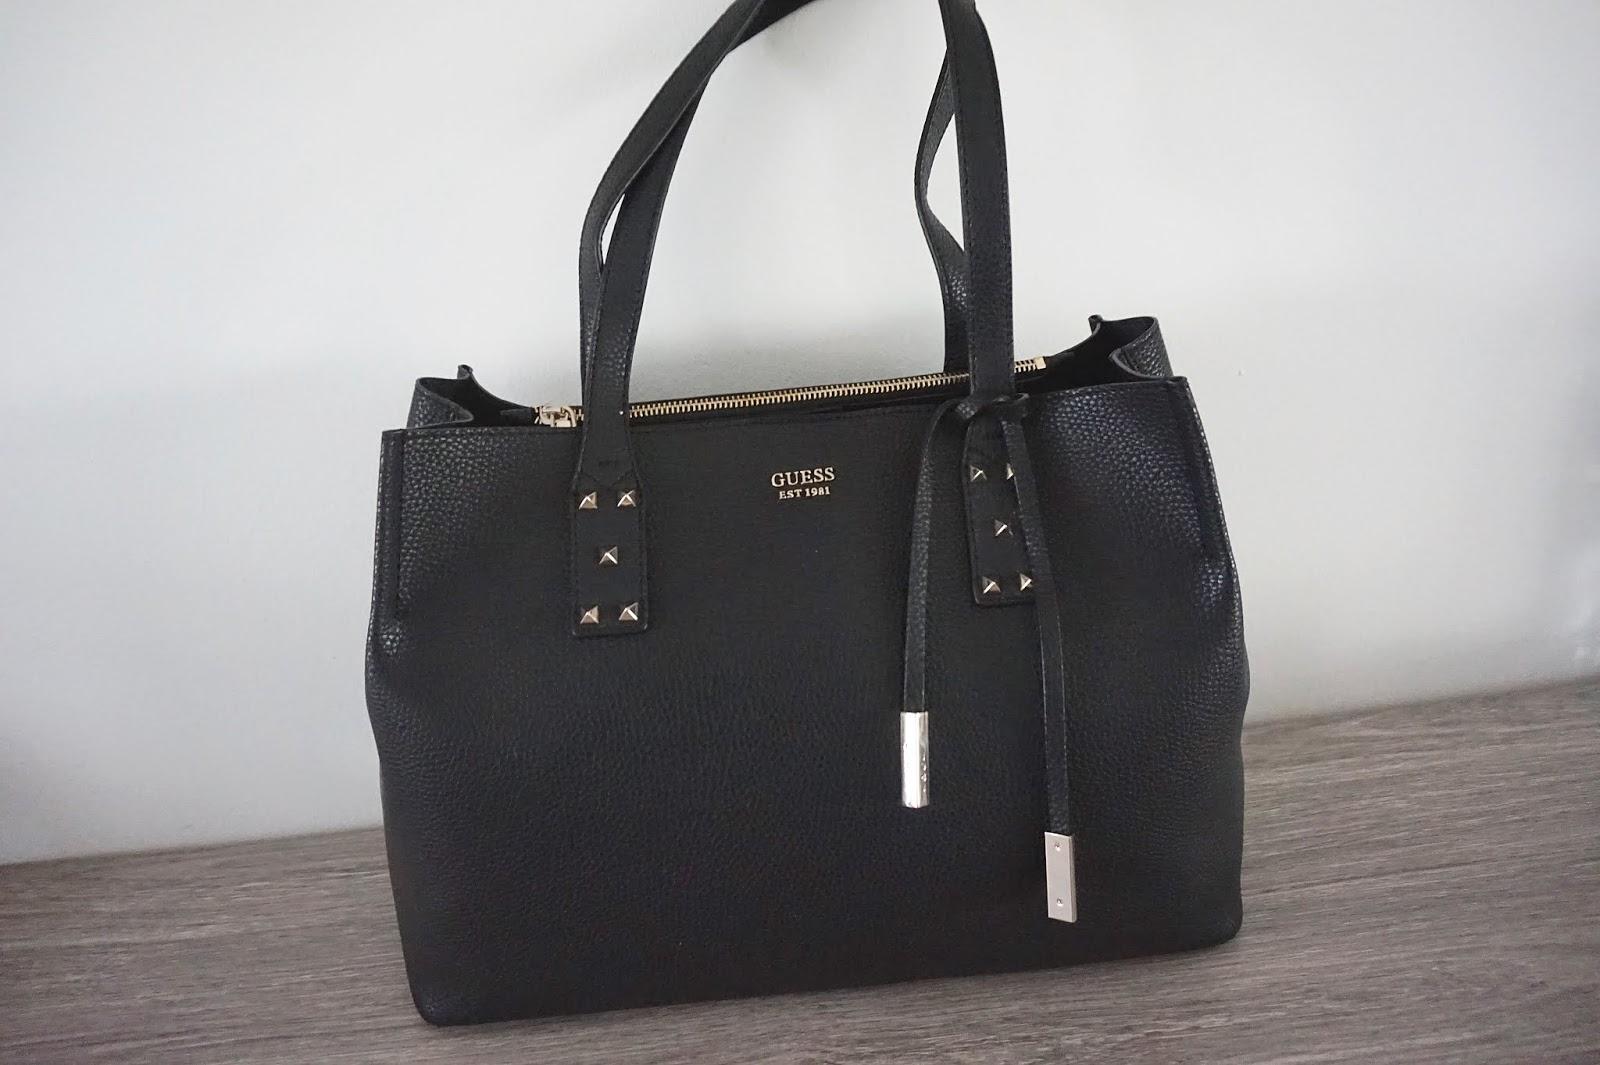 bb59f33a98e Mijn nieuwe Guess tas